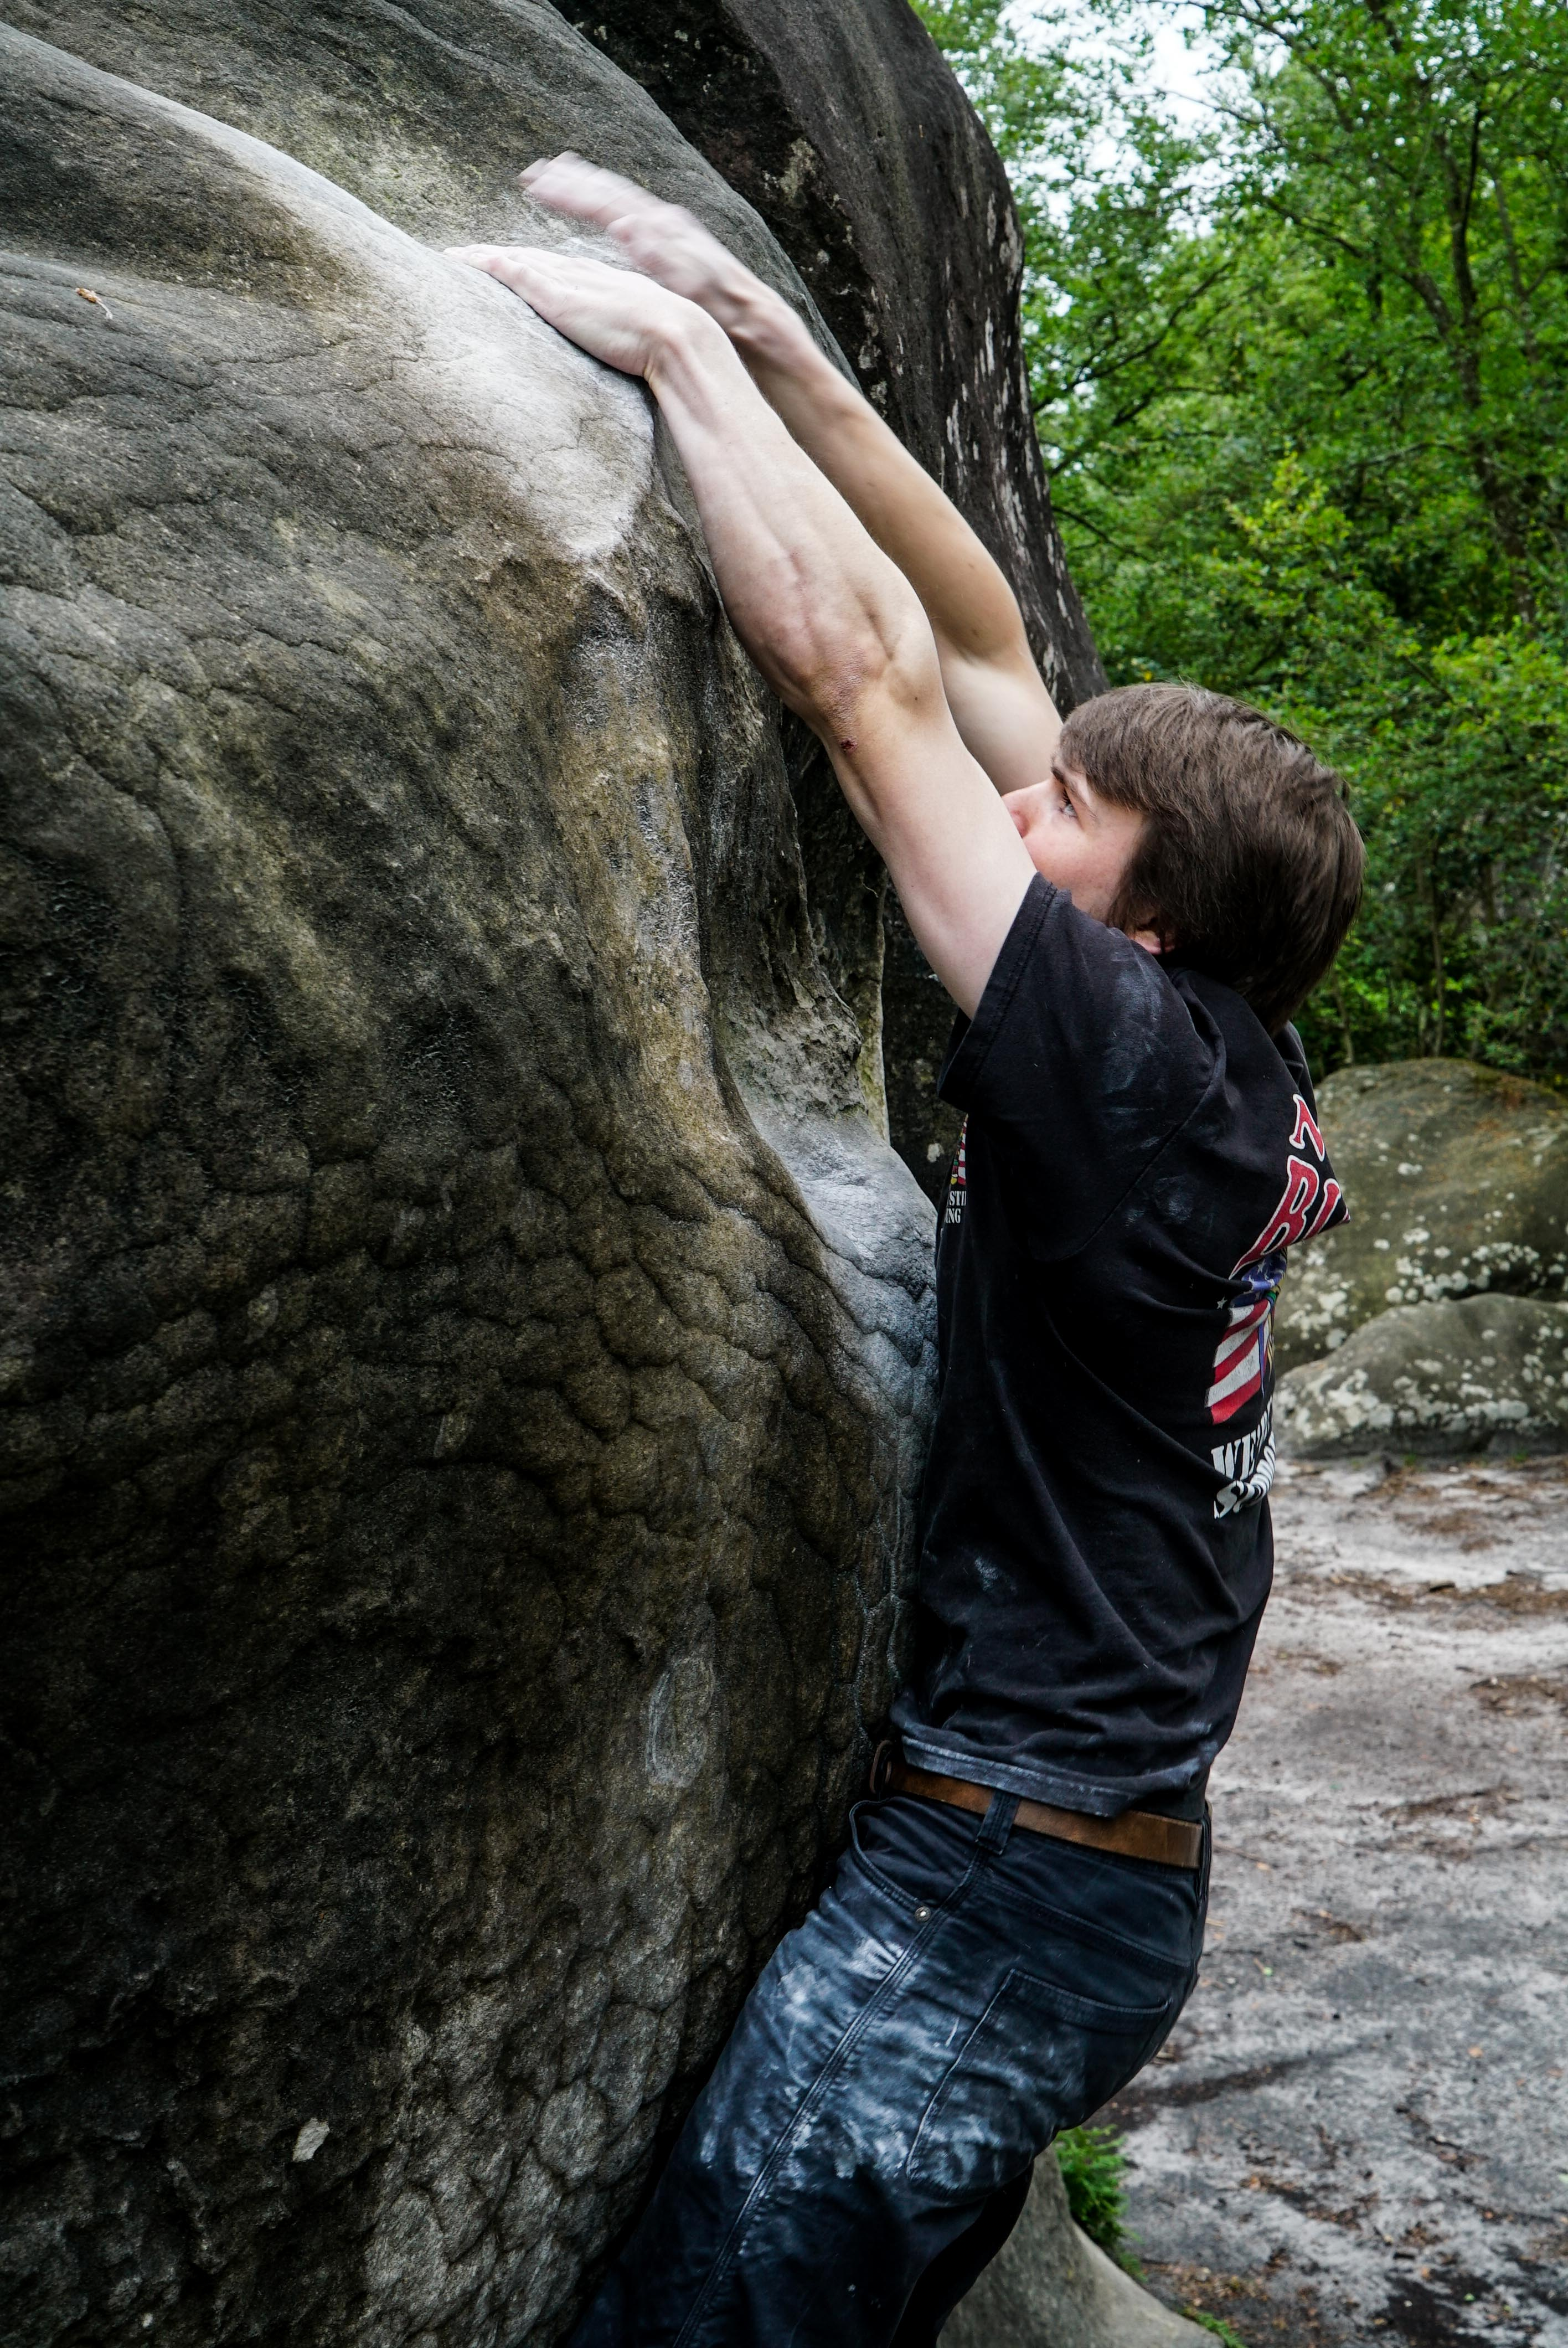 fontainbleau climbing 2016 mike brindley-92